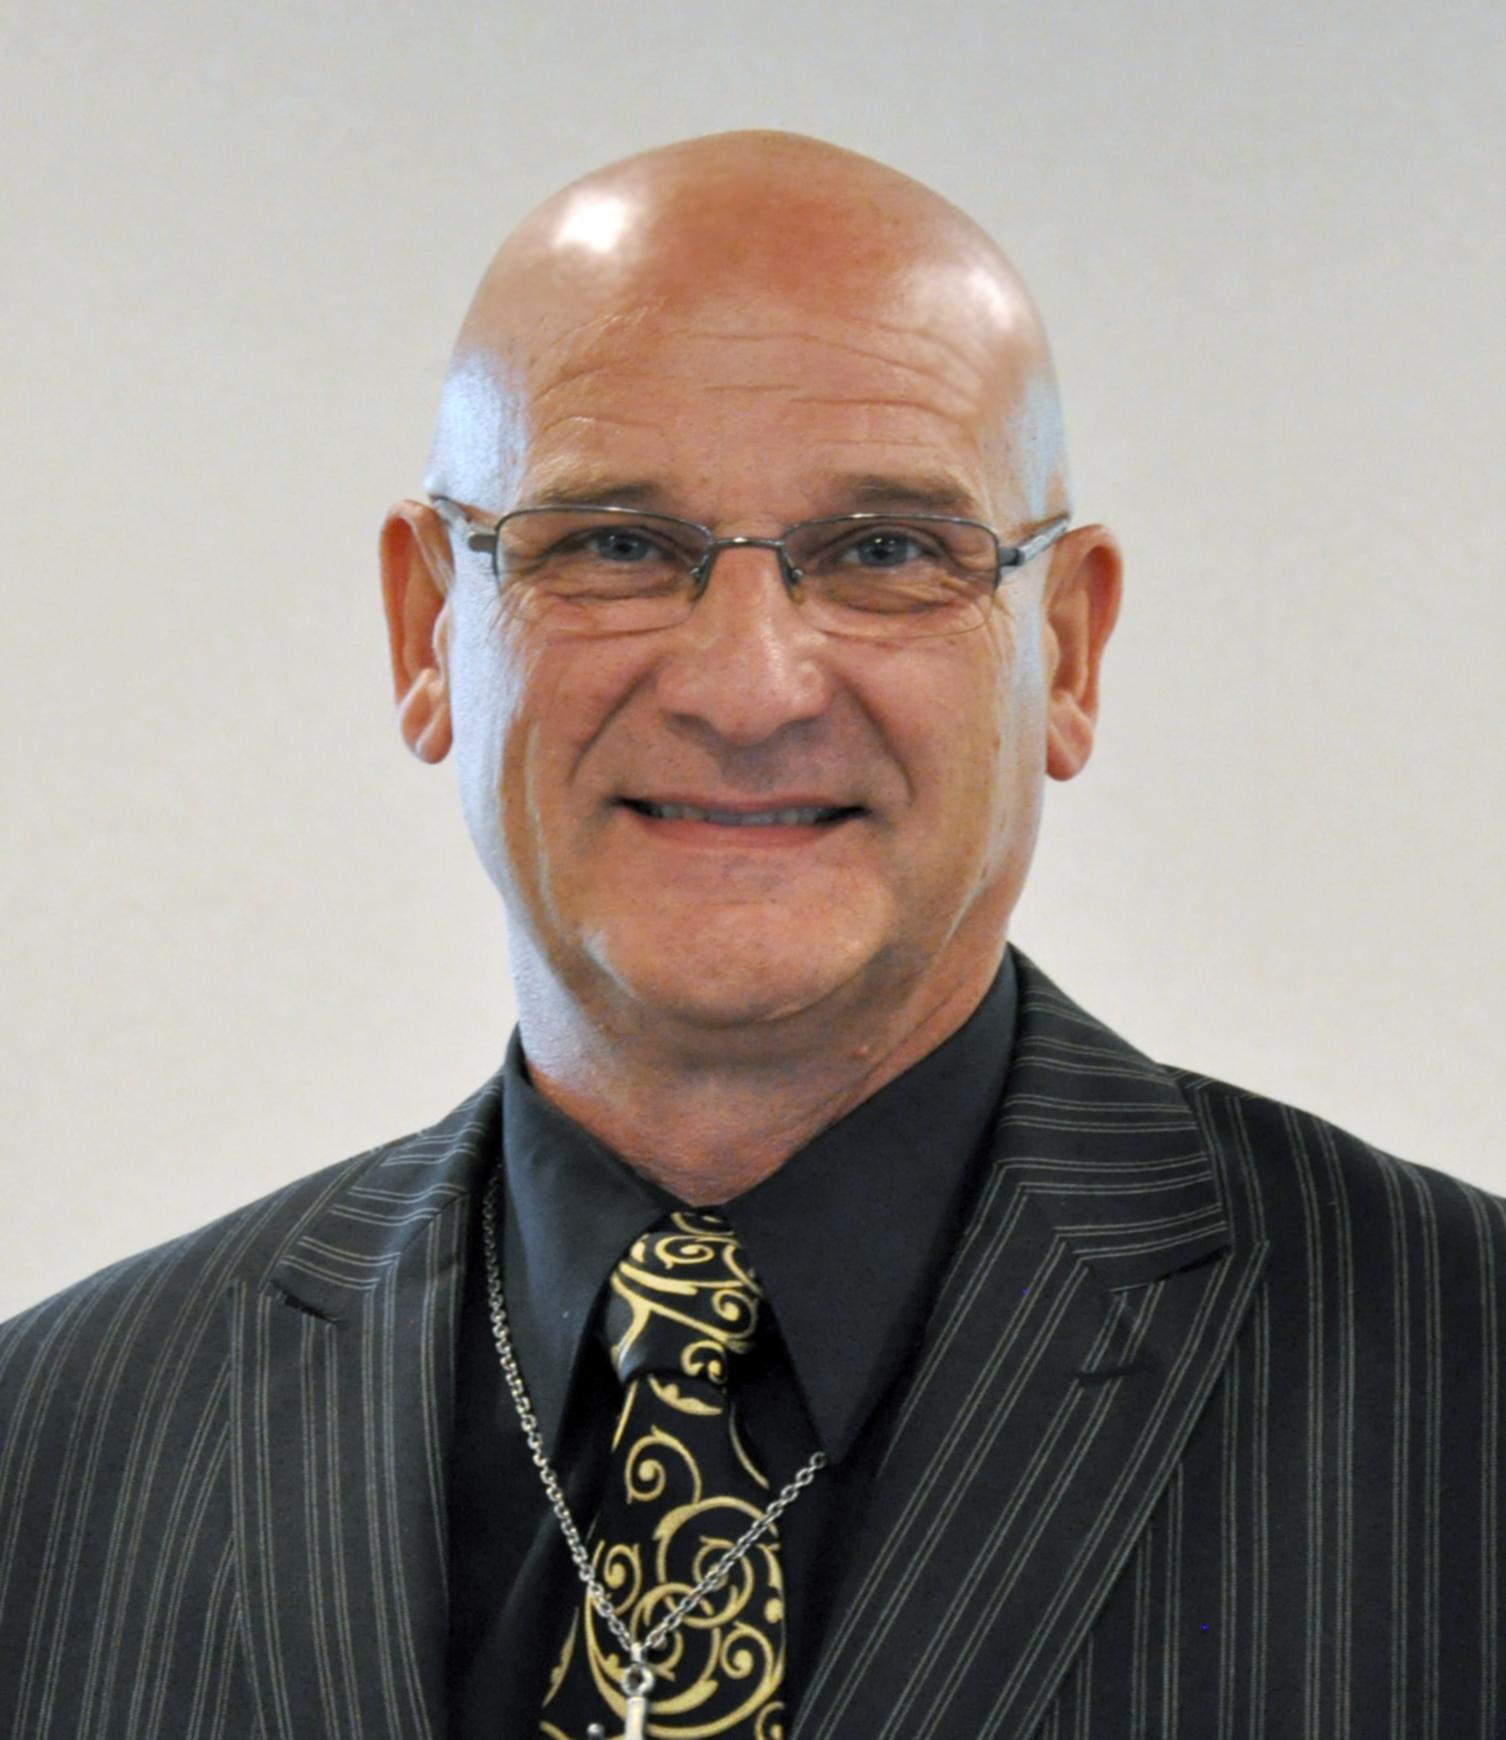 Reverend Mark Marxhausen